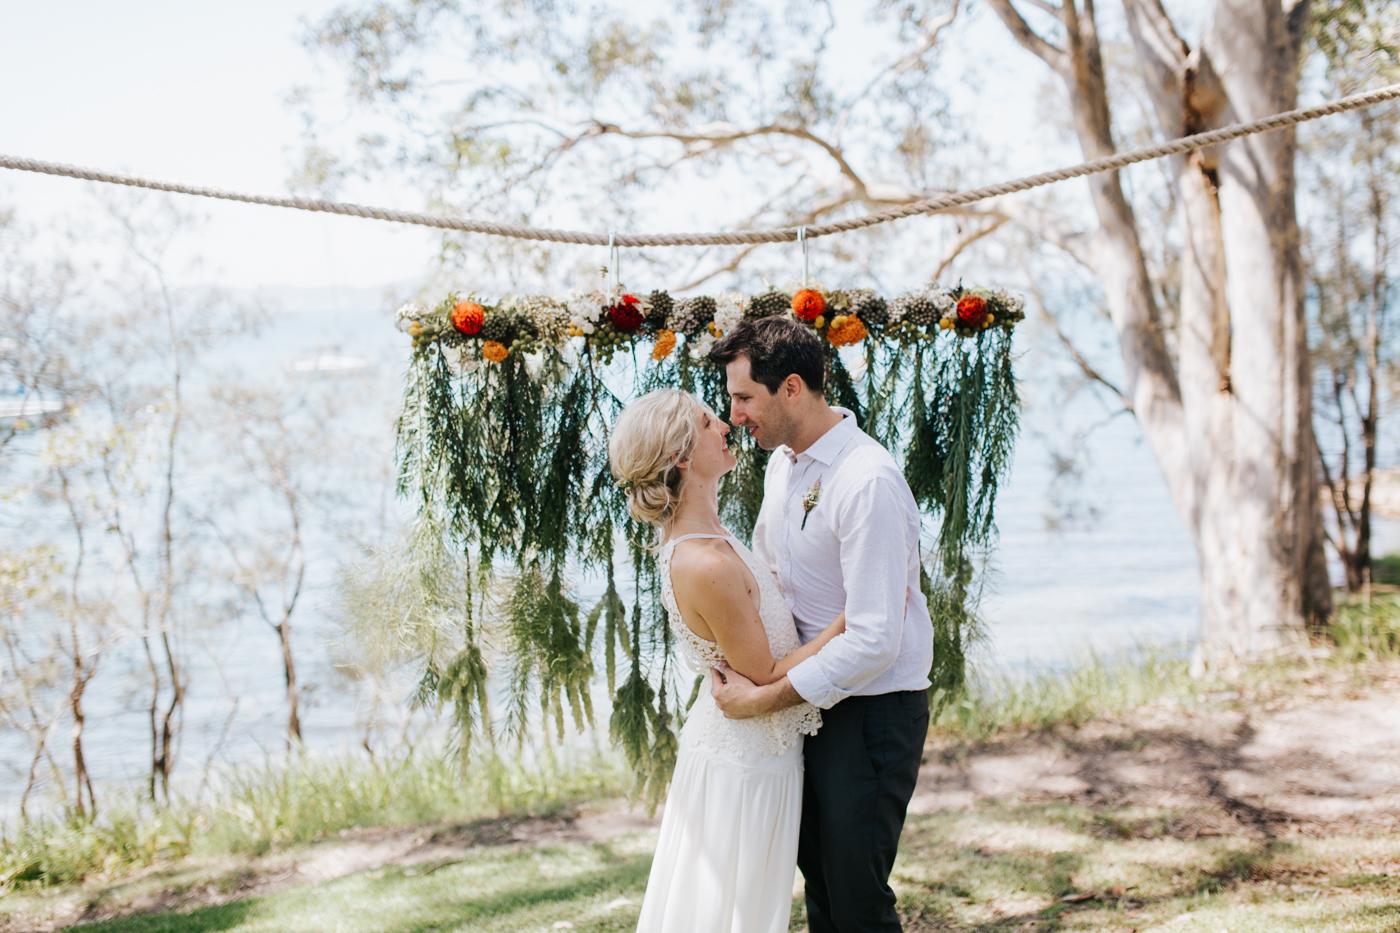 Emma & Ben - Lake Macquarie - Hunter Valley Wedding - Samantha Heather Photography-124.jpg